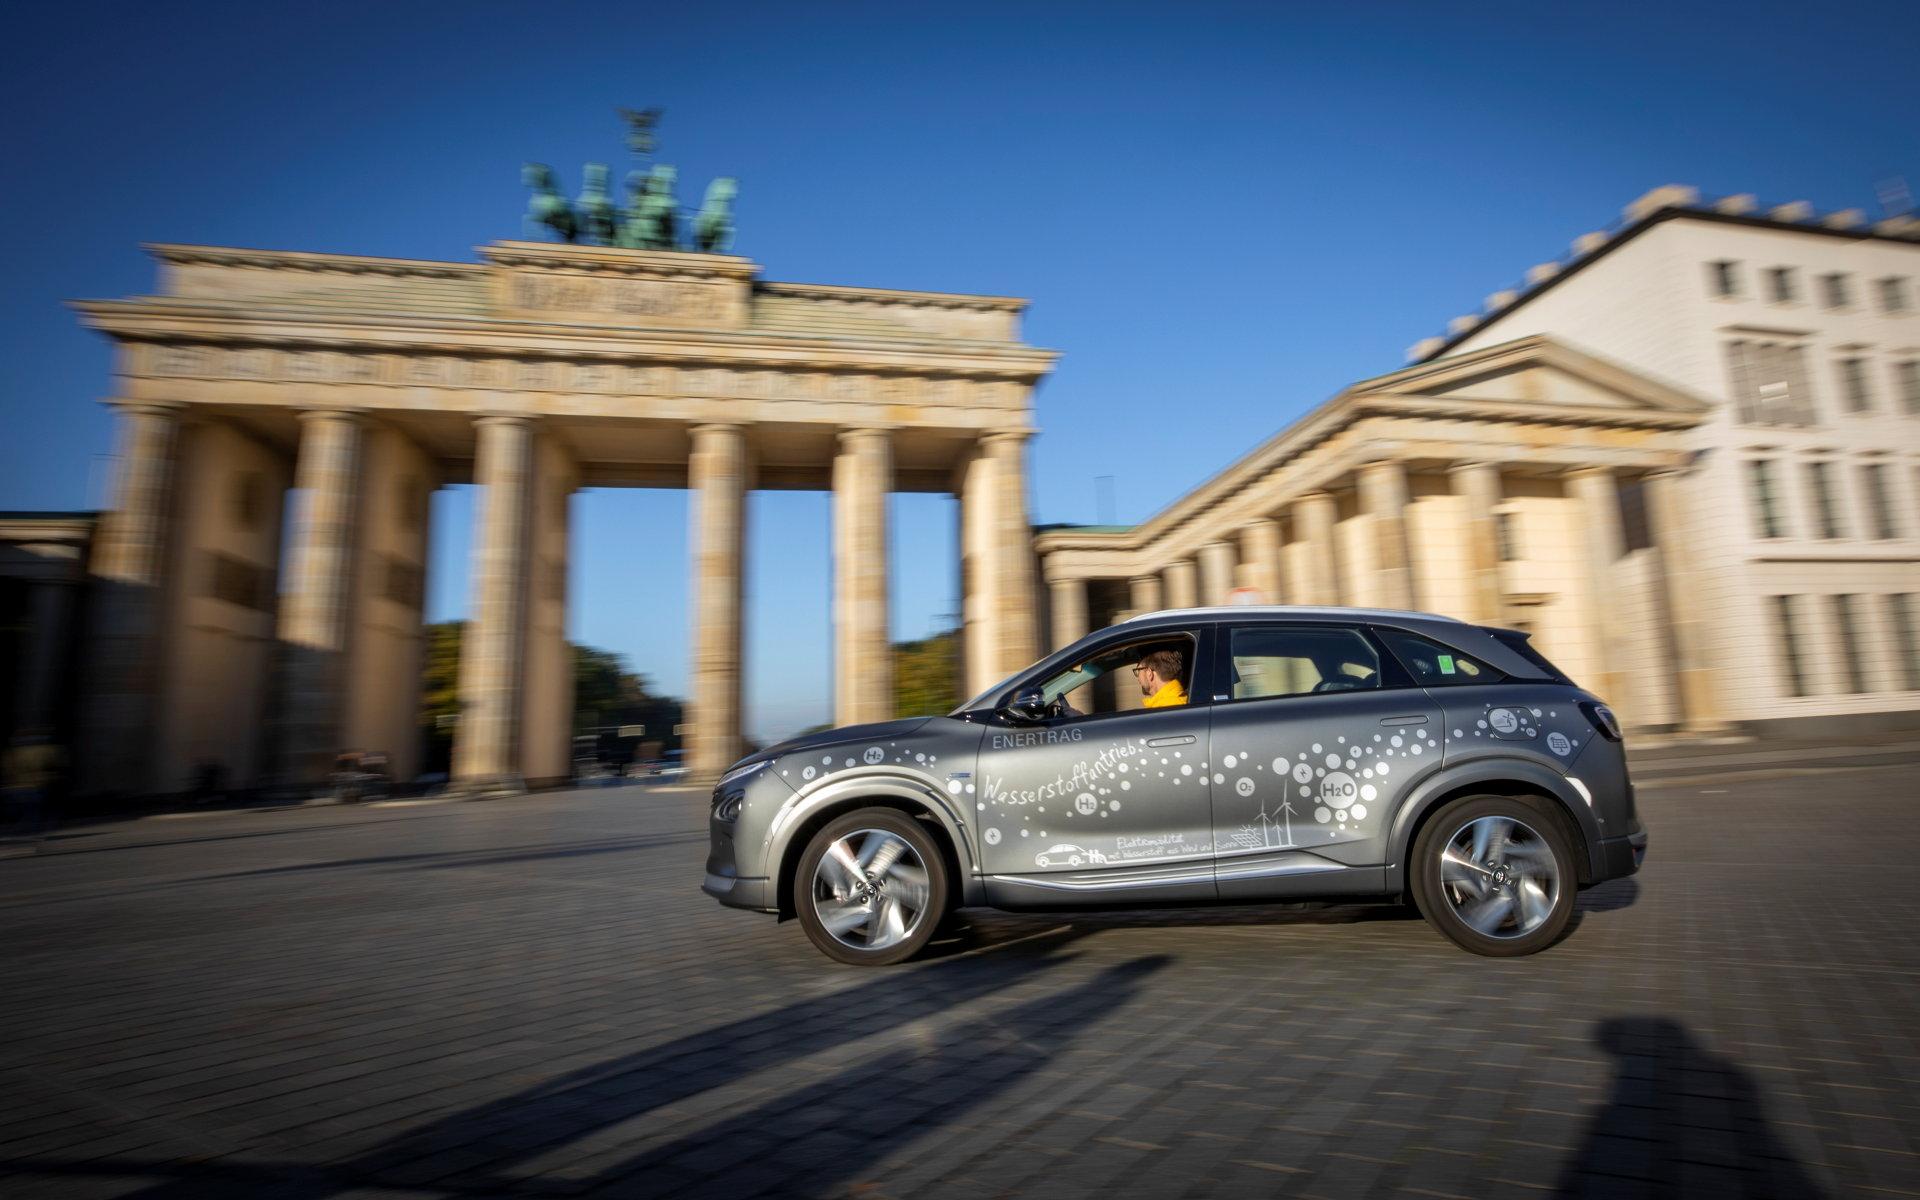 Graues Auto vor Brandenburger Tor in Berlin.